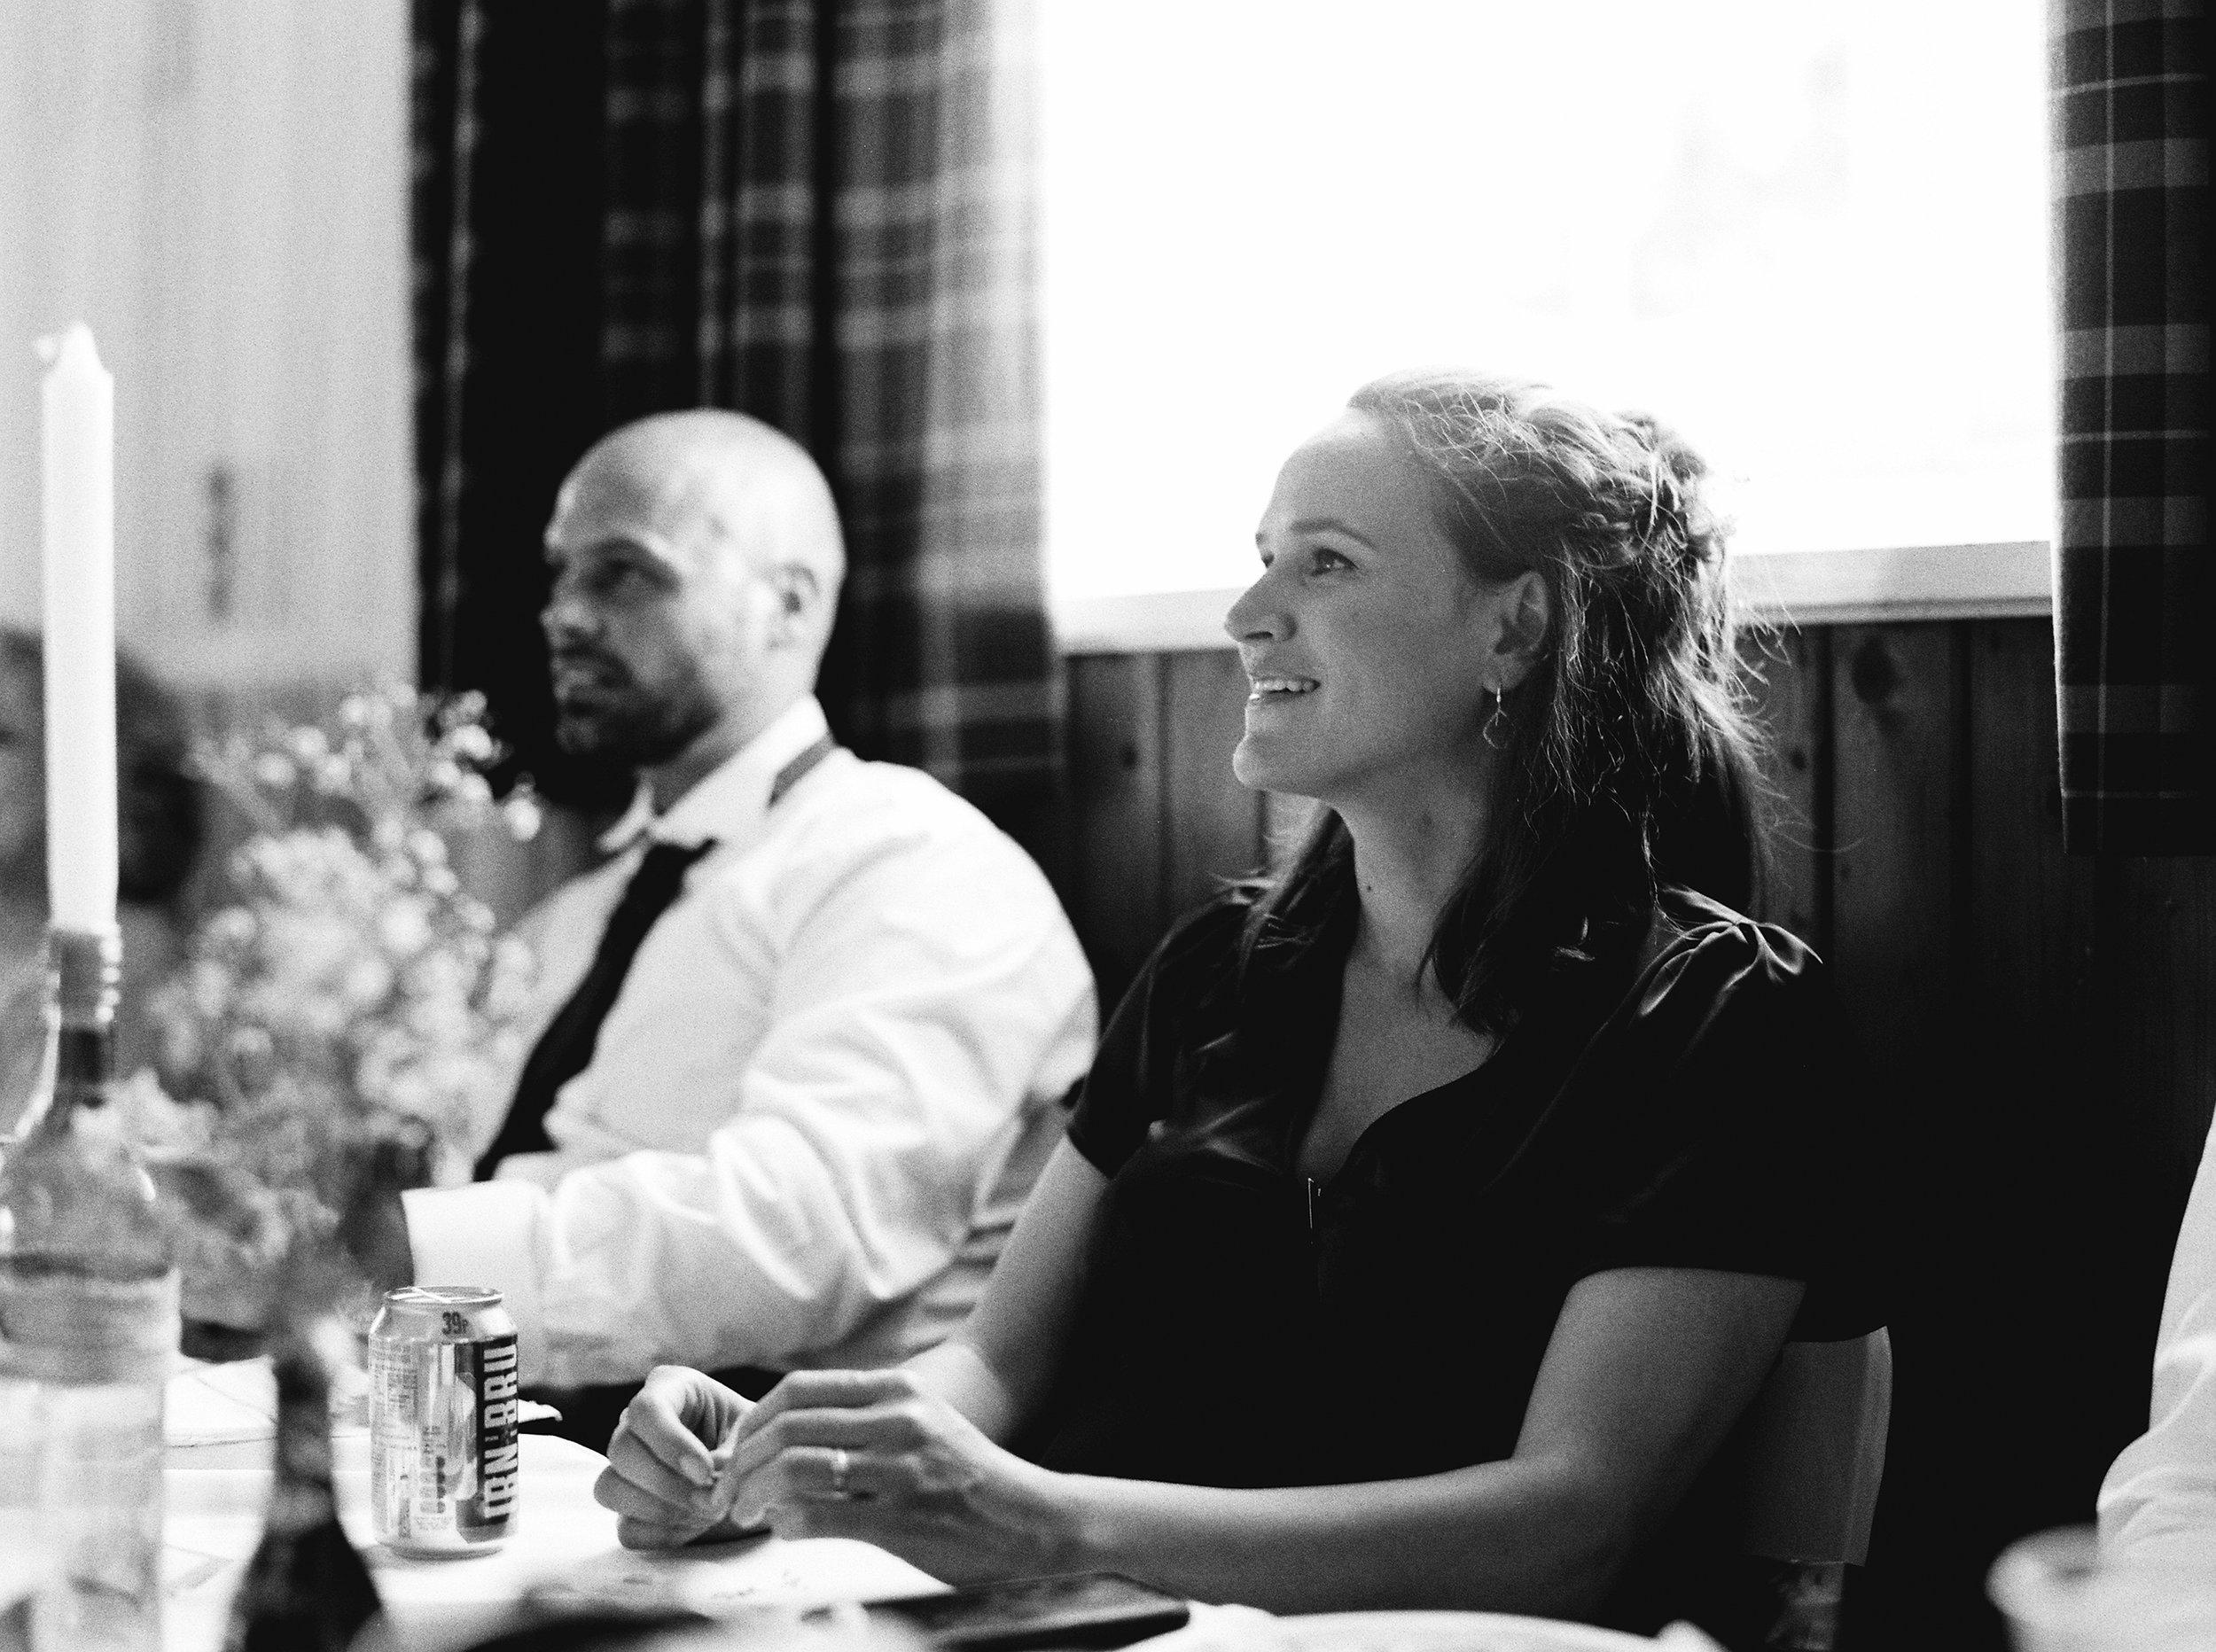 wedding-photography-scotland190.jpg